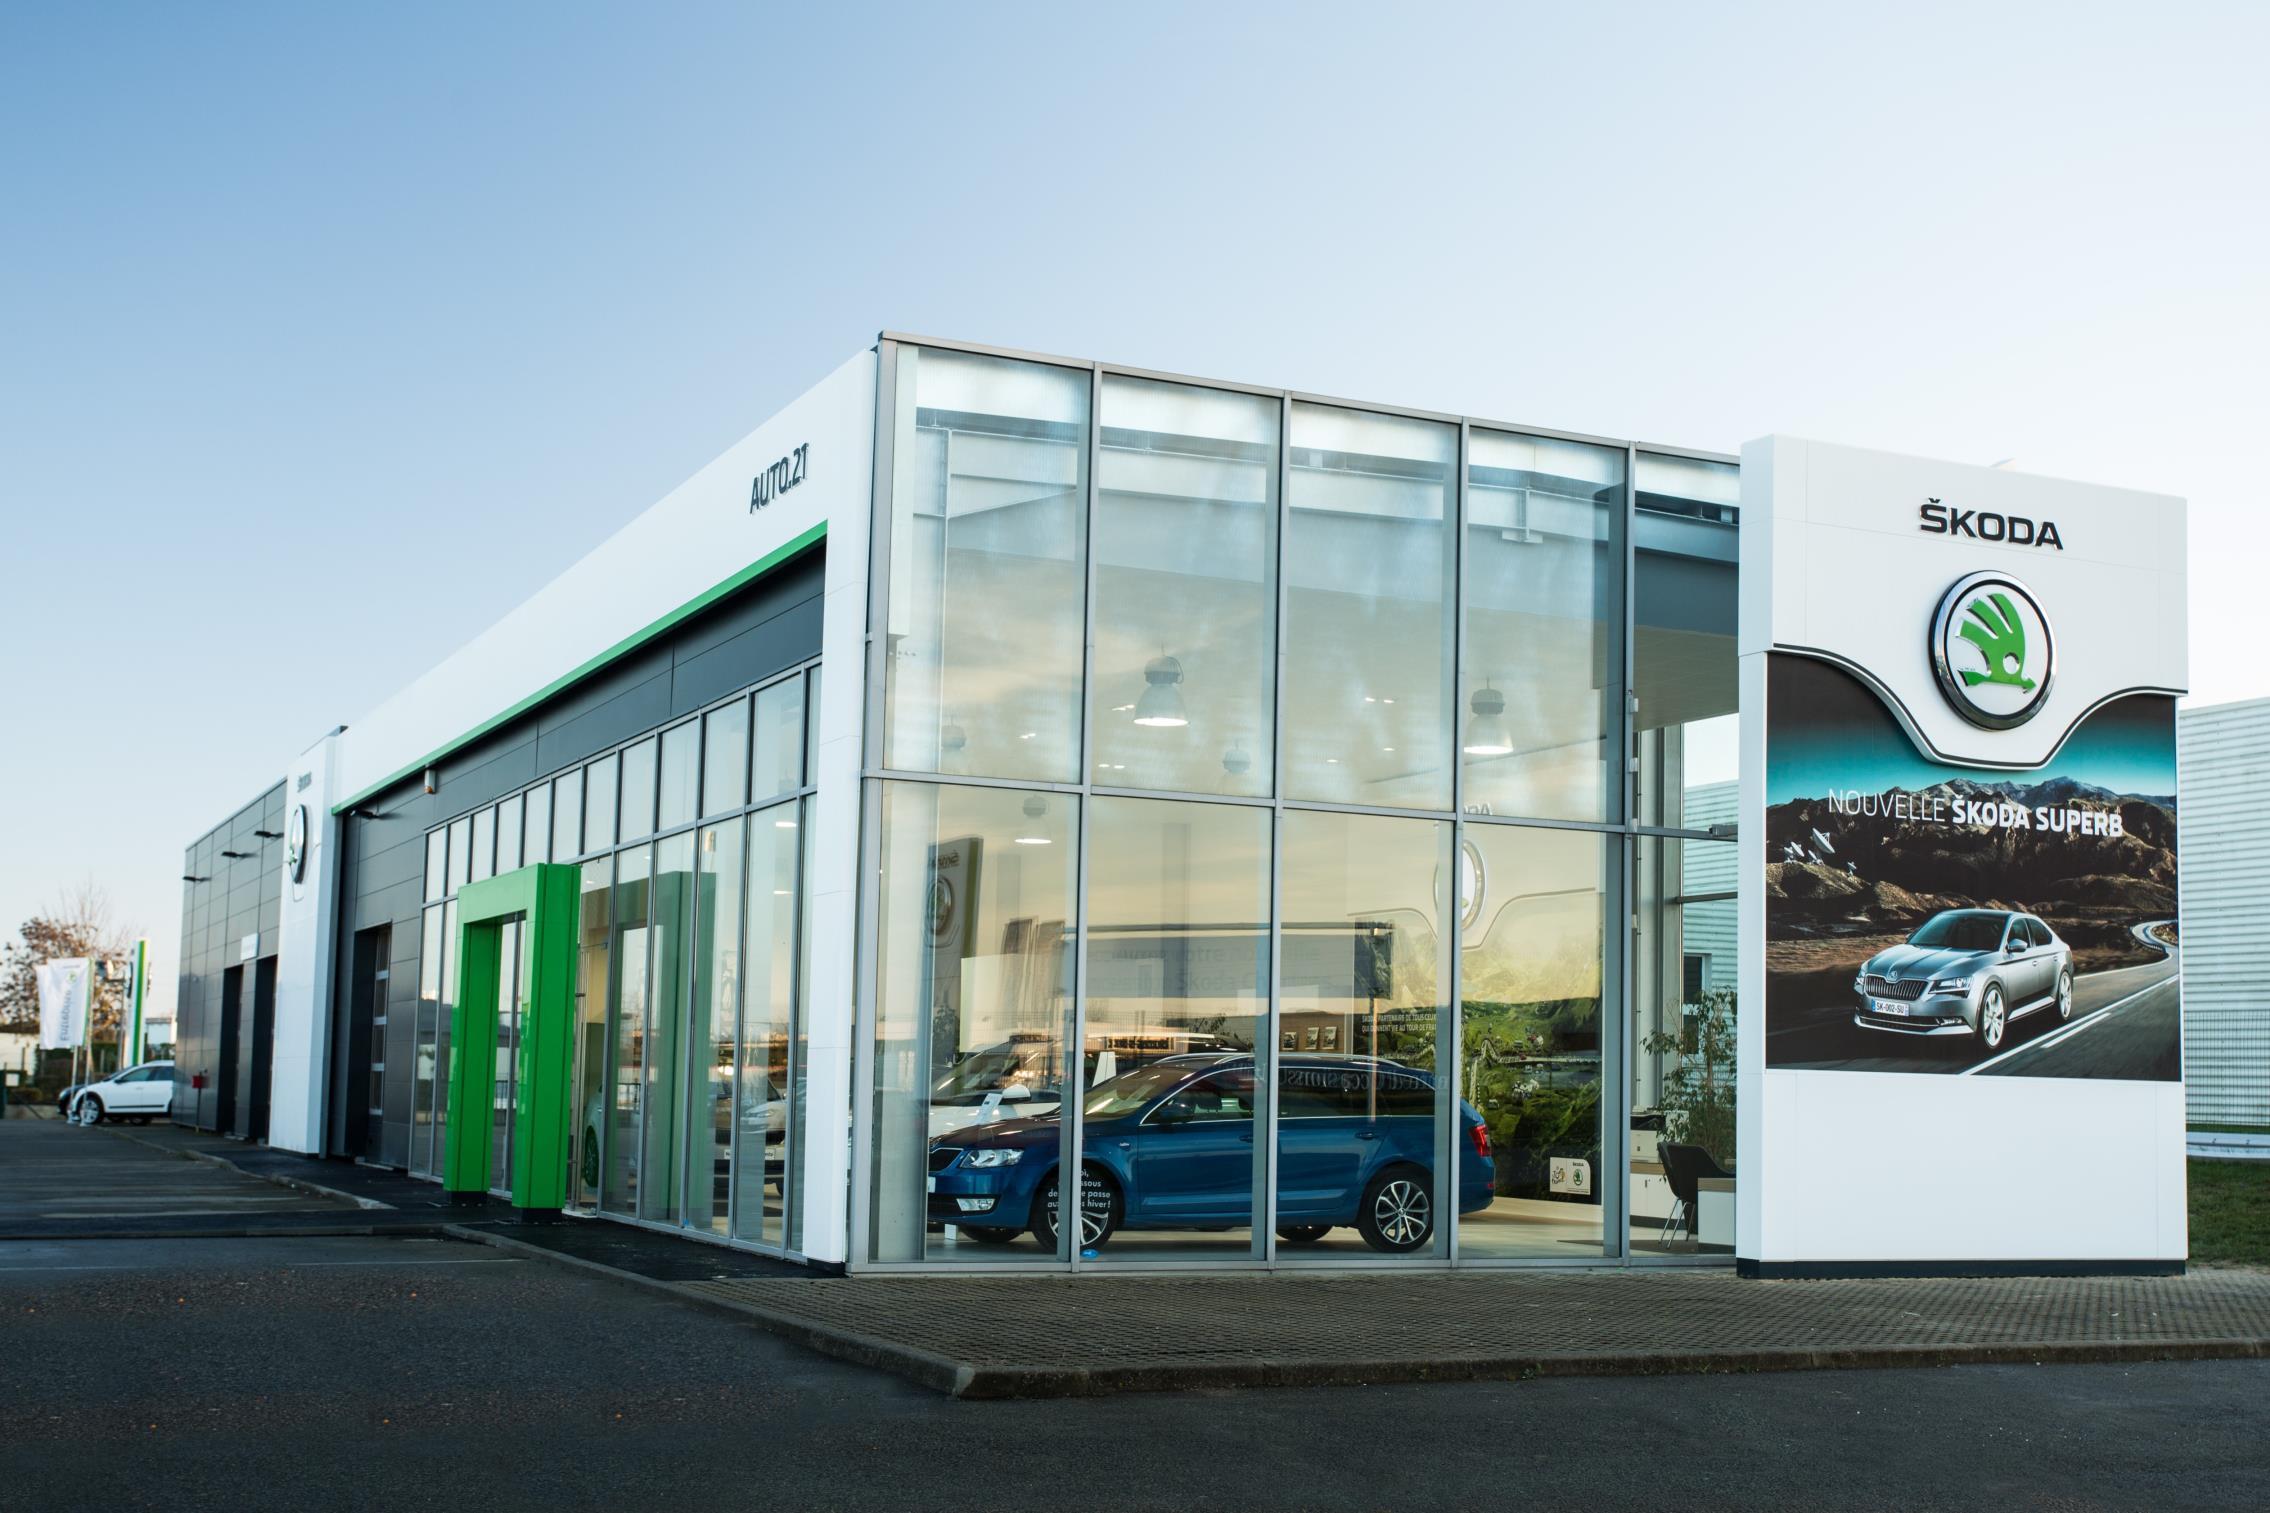 Skoda a top five best selling car brand in Ireland